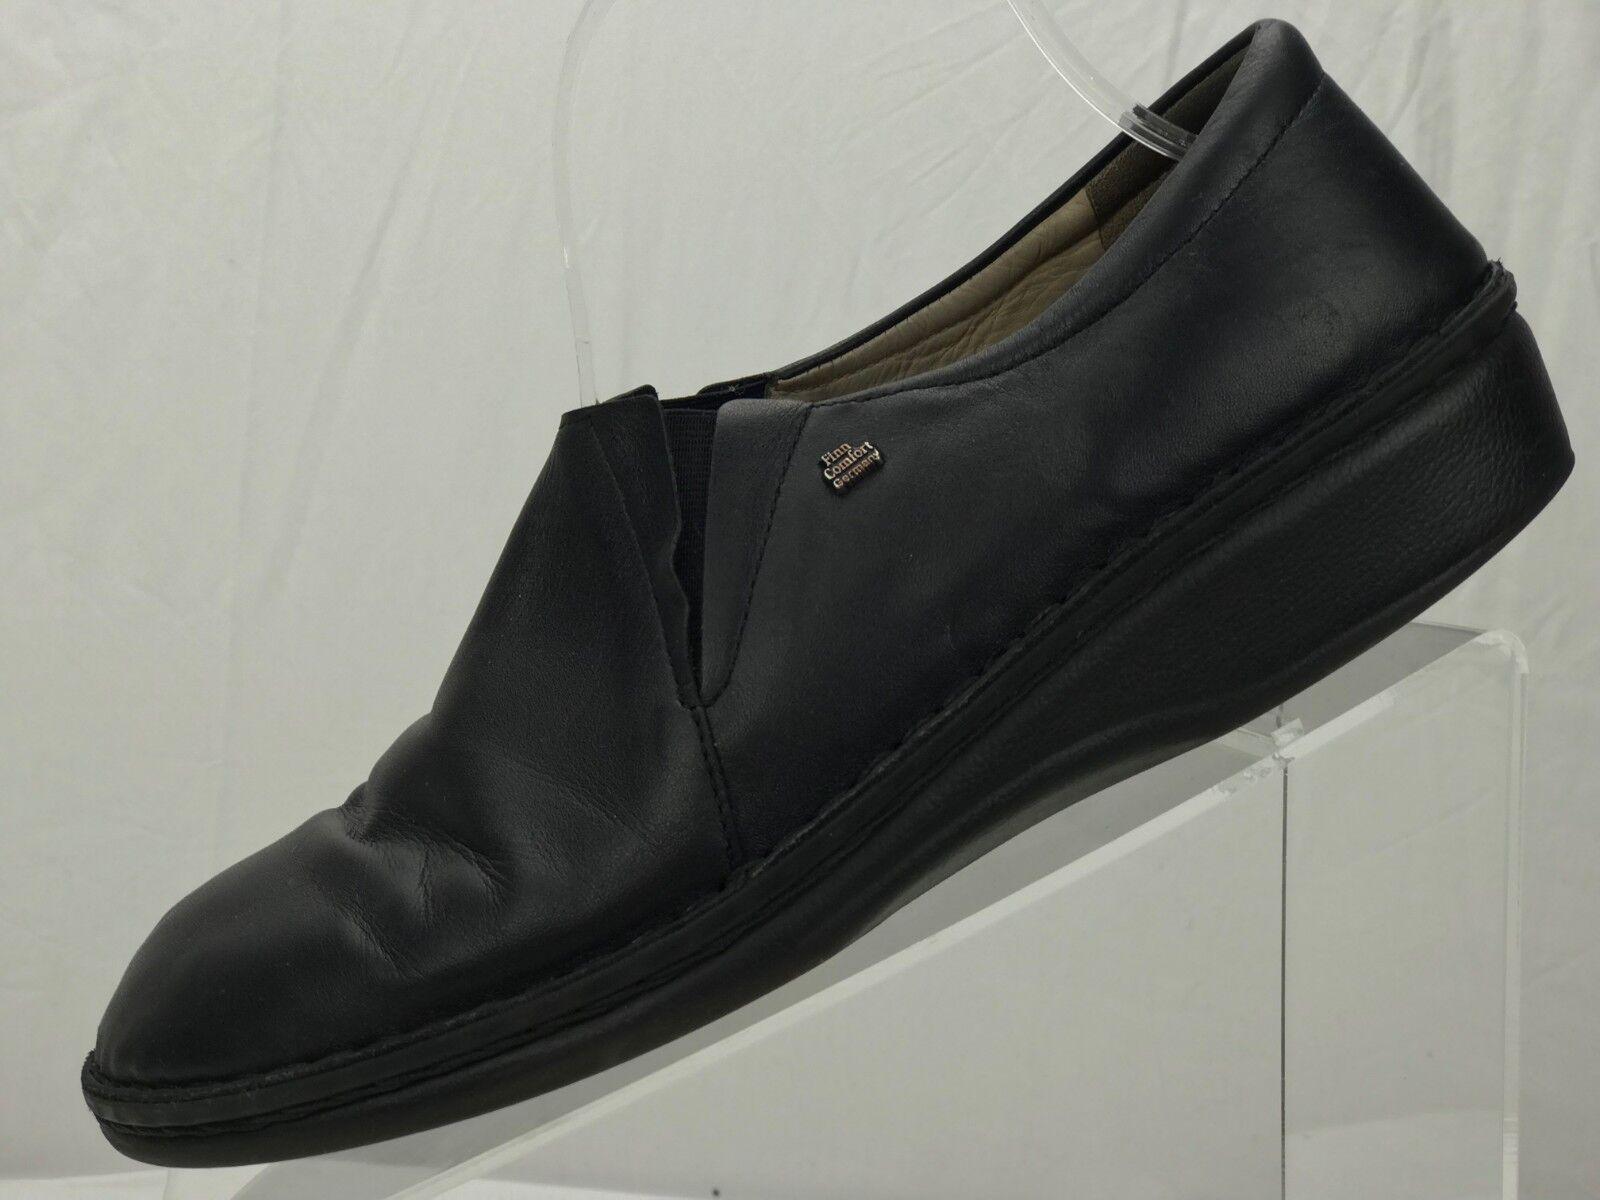 FINN COMFORT Newport Loafers- Slip-On Black Leather Shoe Germany Womens 40,9/9.5